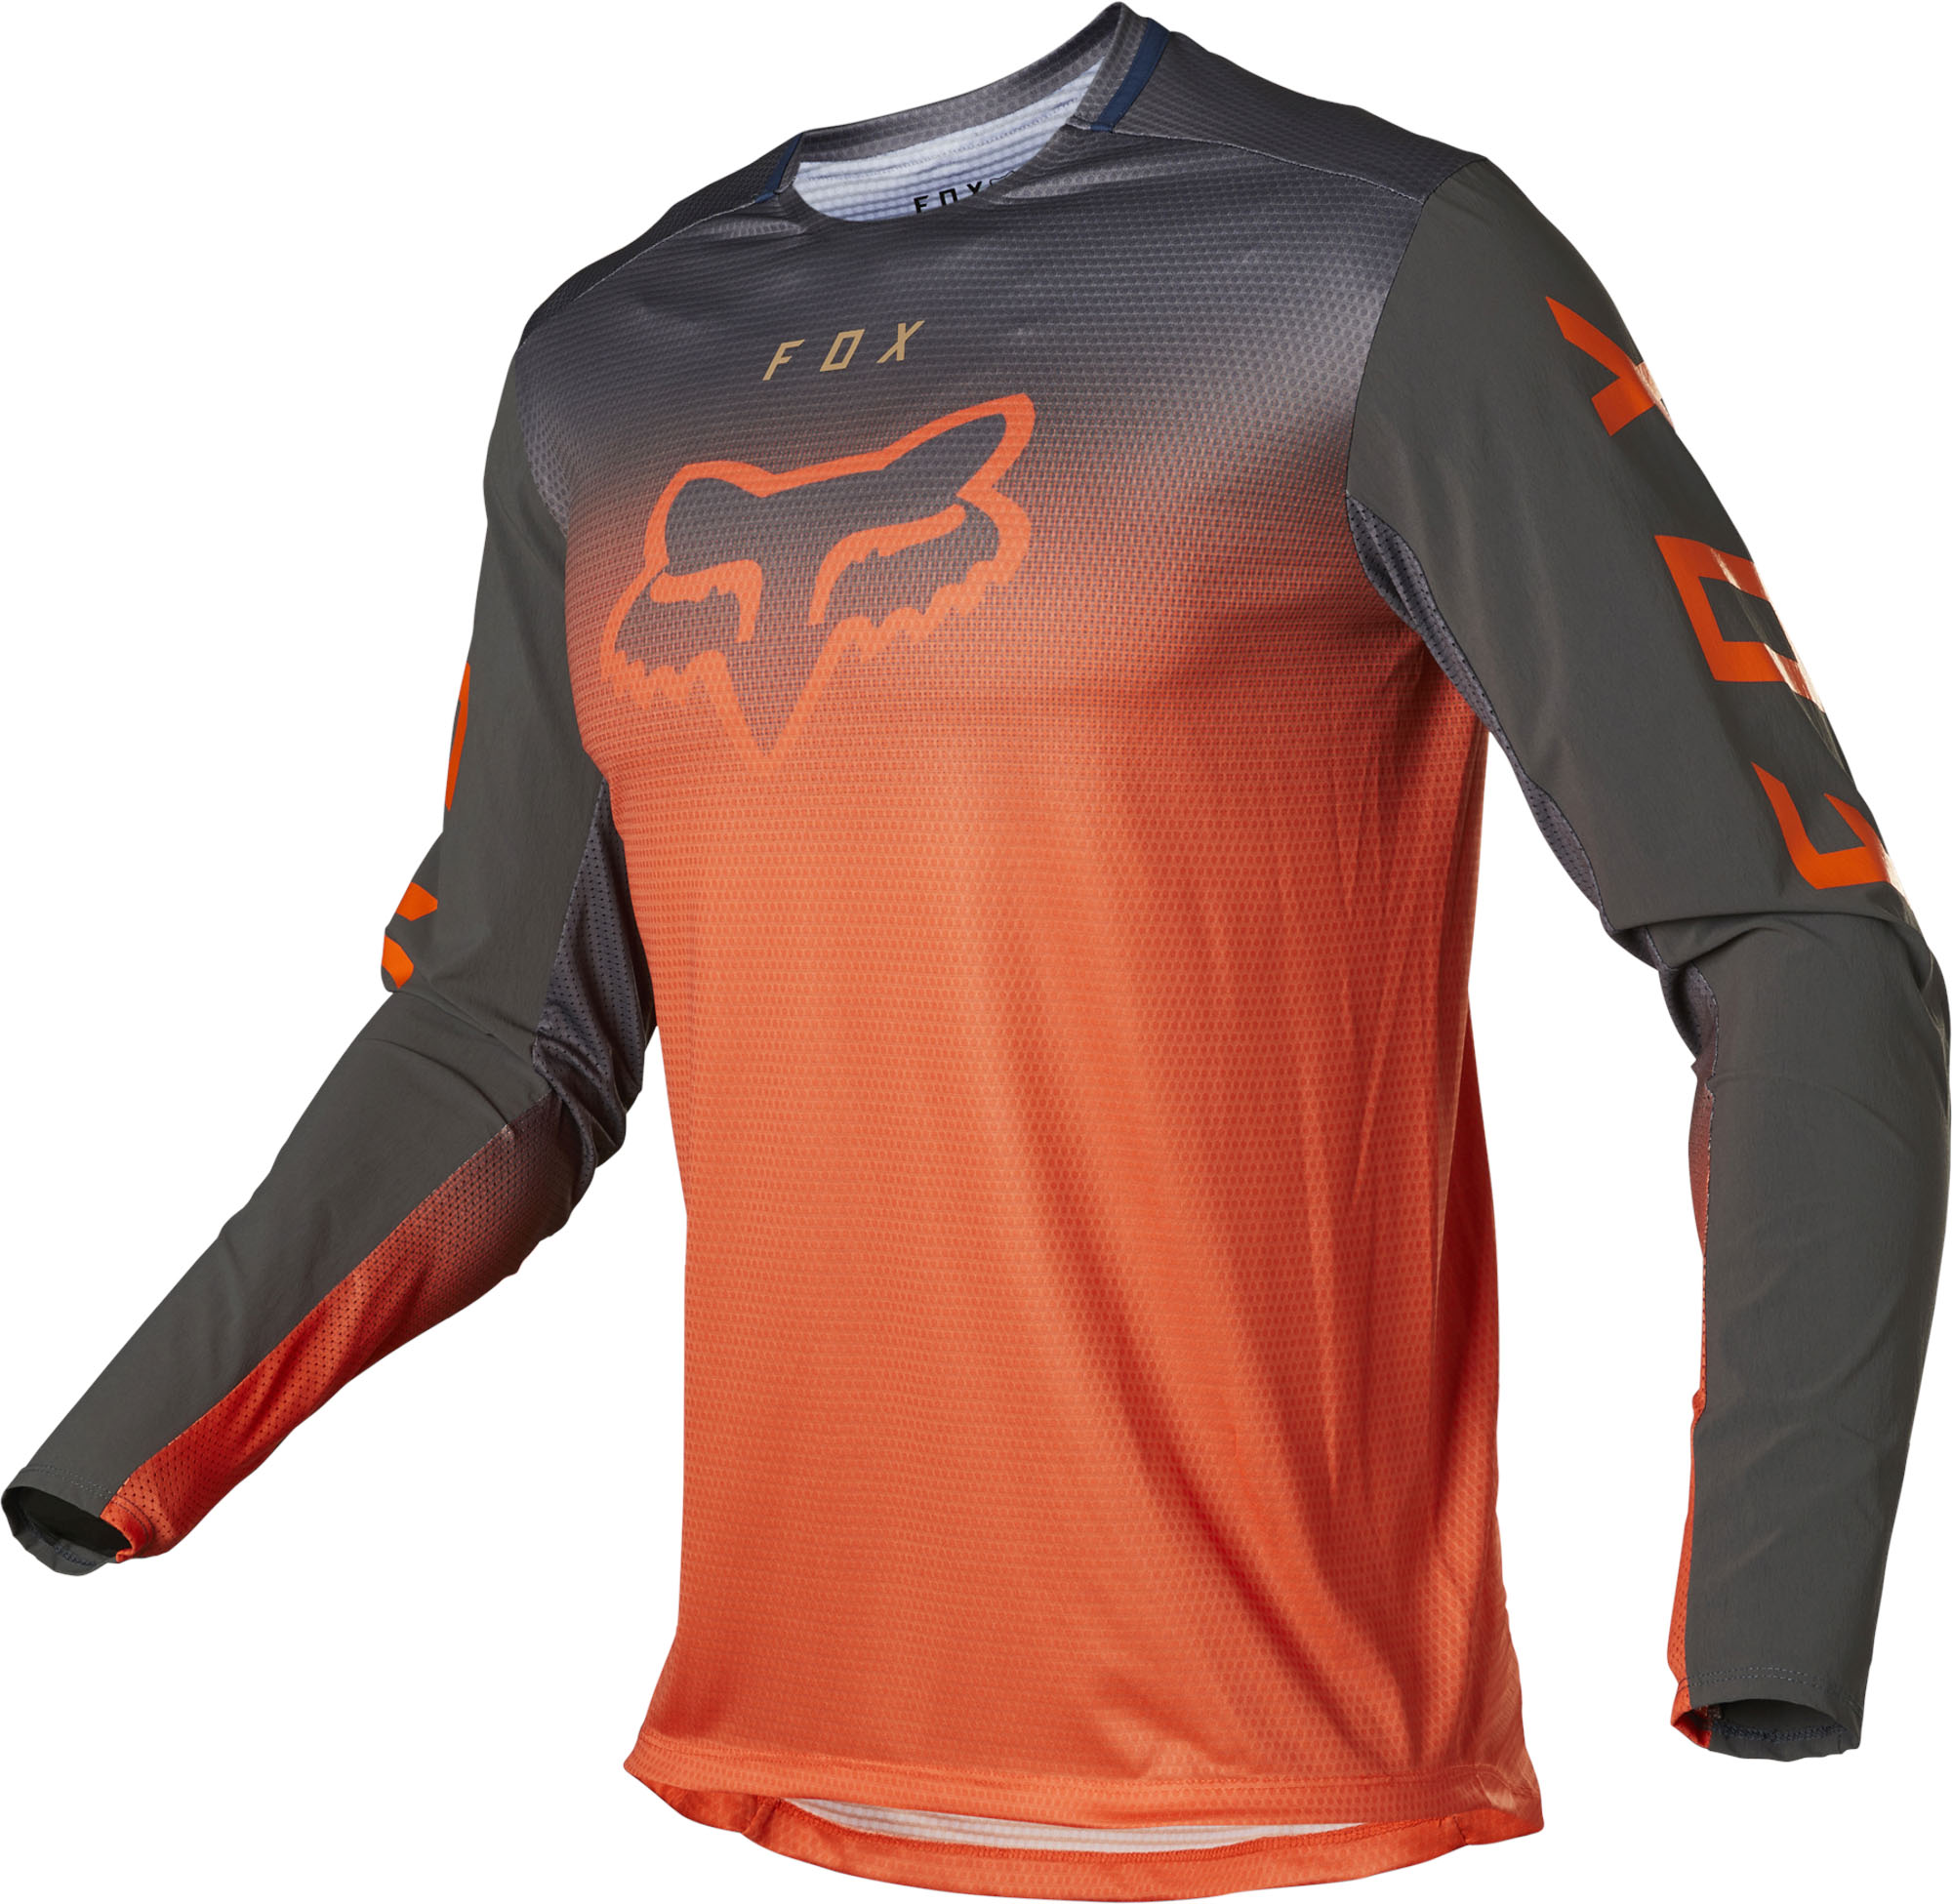 FOX Legion Jersey - Orange MX22